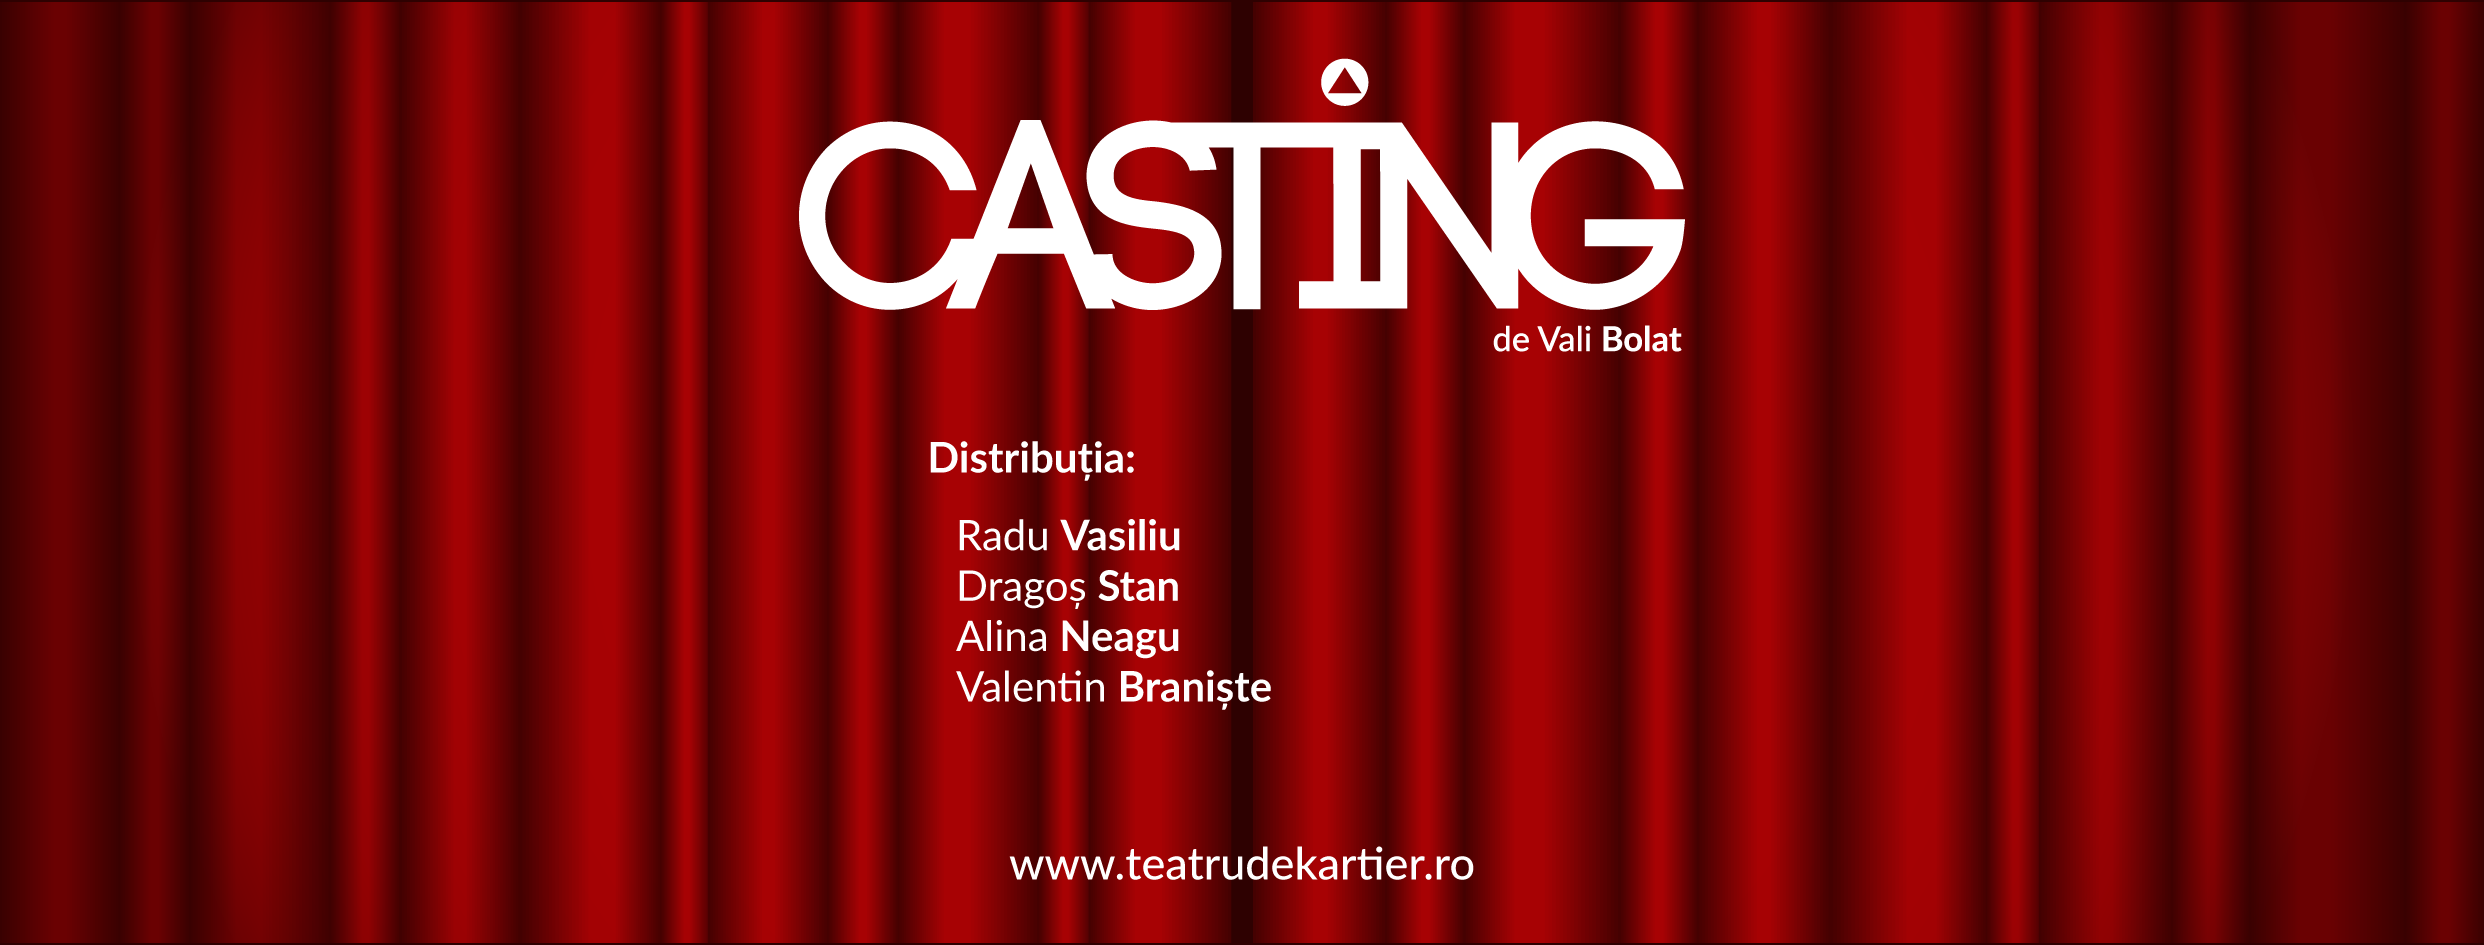 Casting---Cover-Facebook